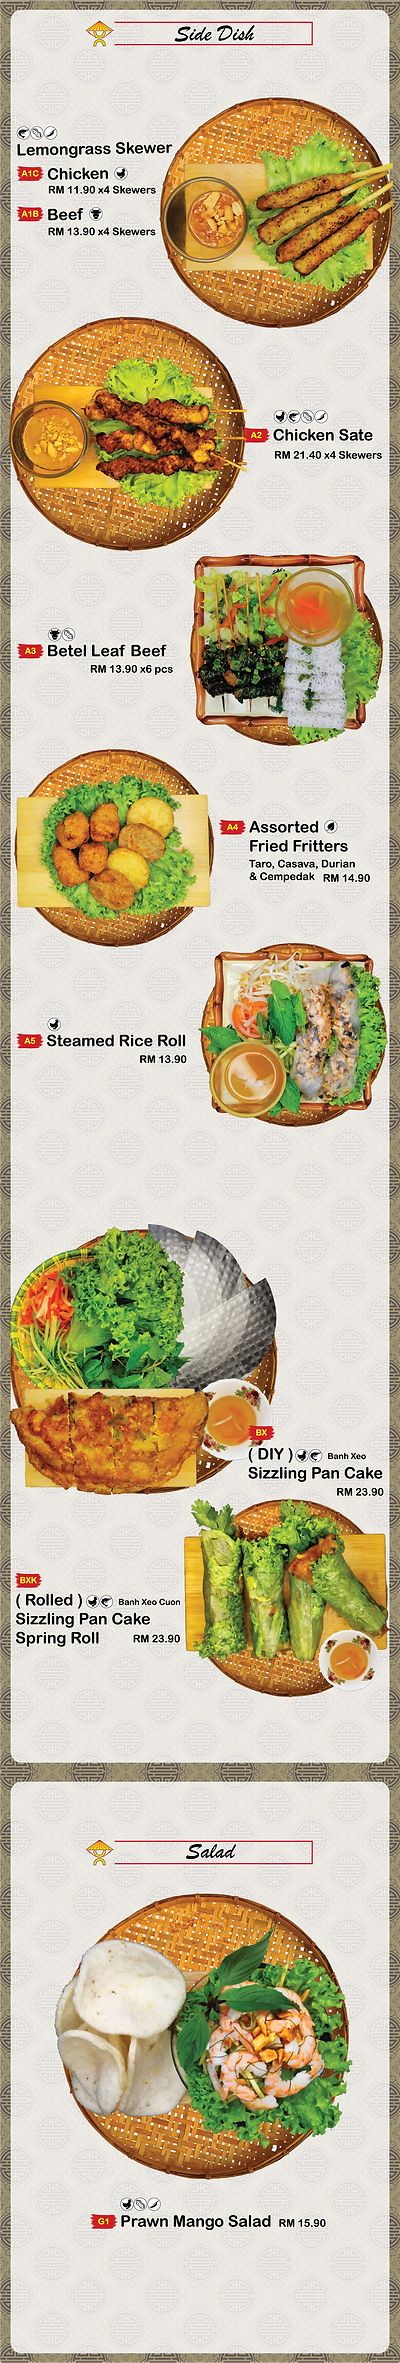 4&567 Side Dish Online.png